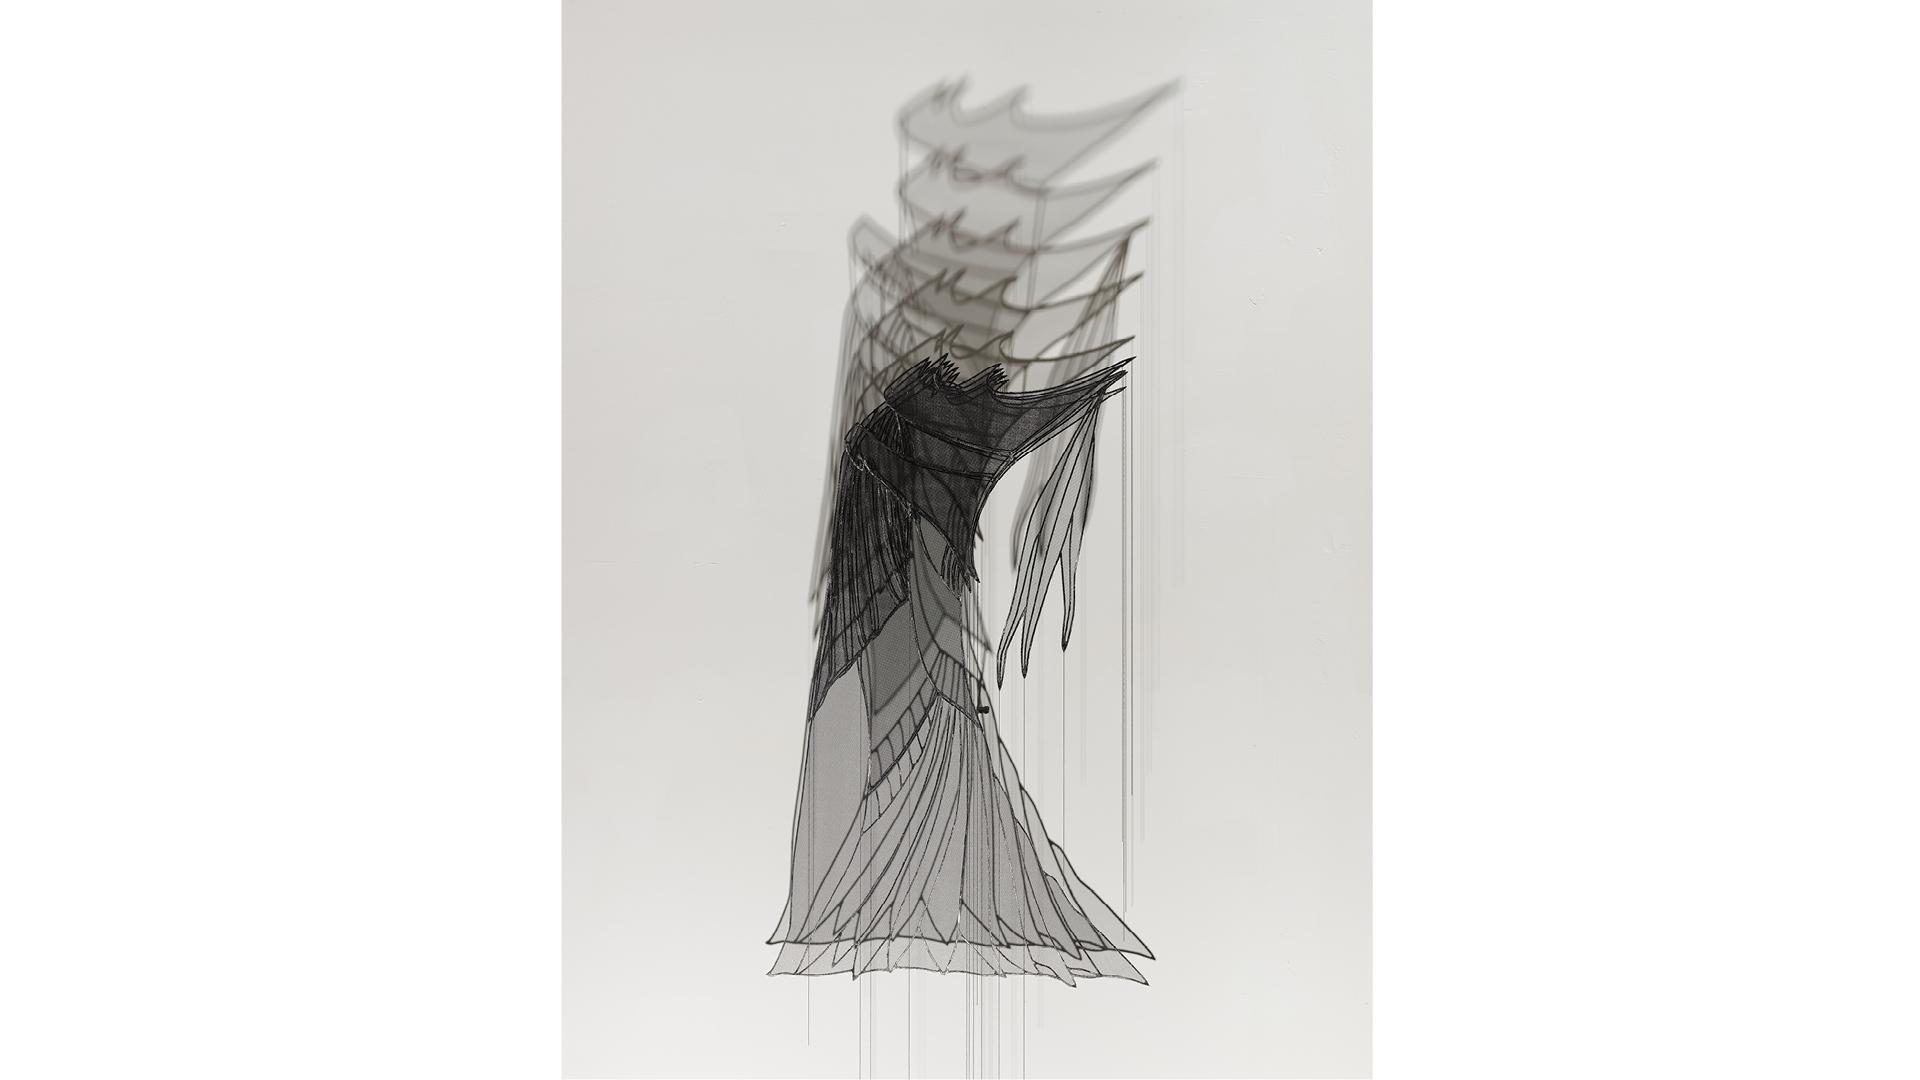 Afruz Amighi Presents No More Disguise At Leila Heller Gallery in New York